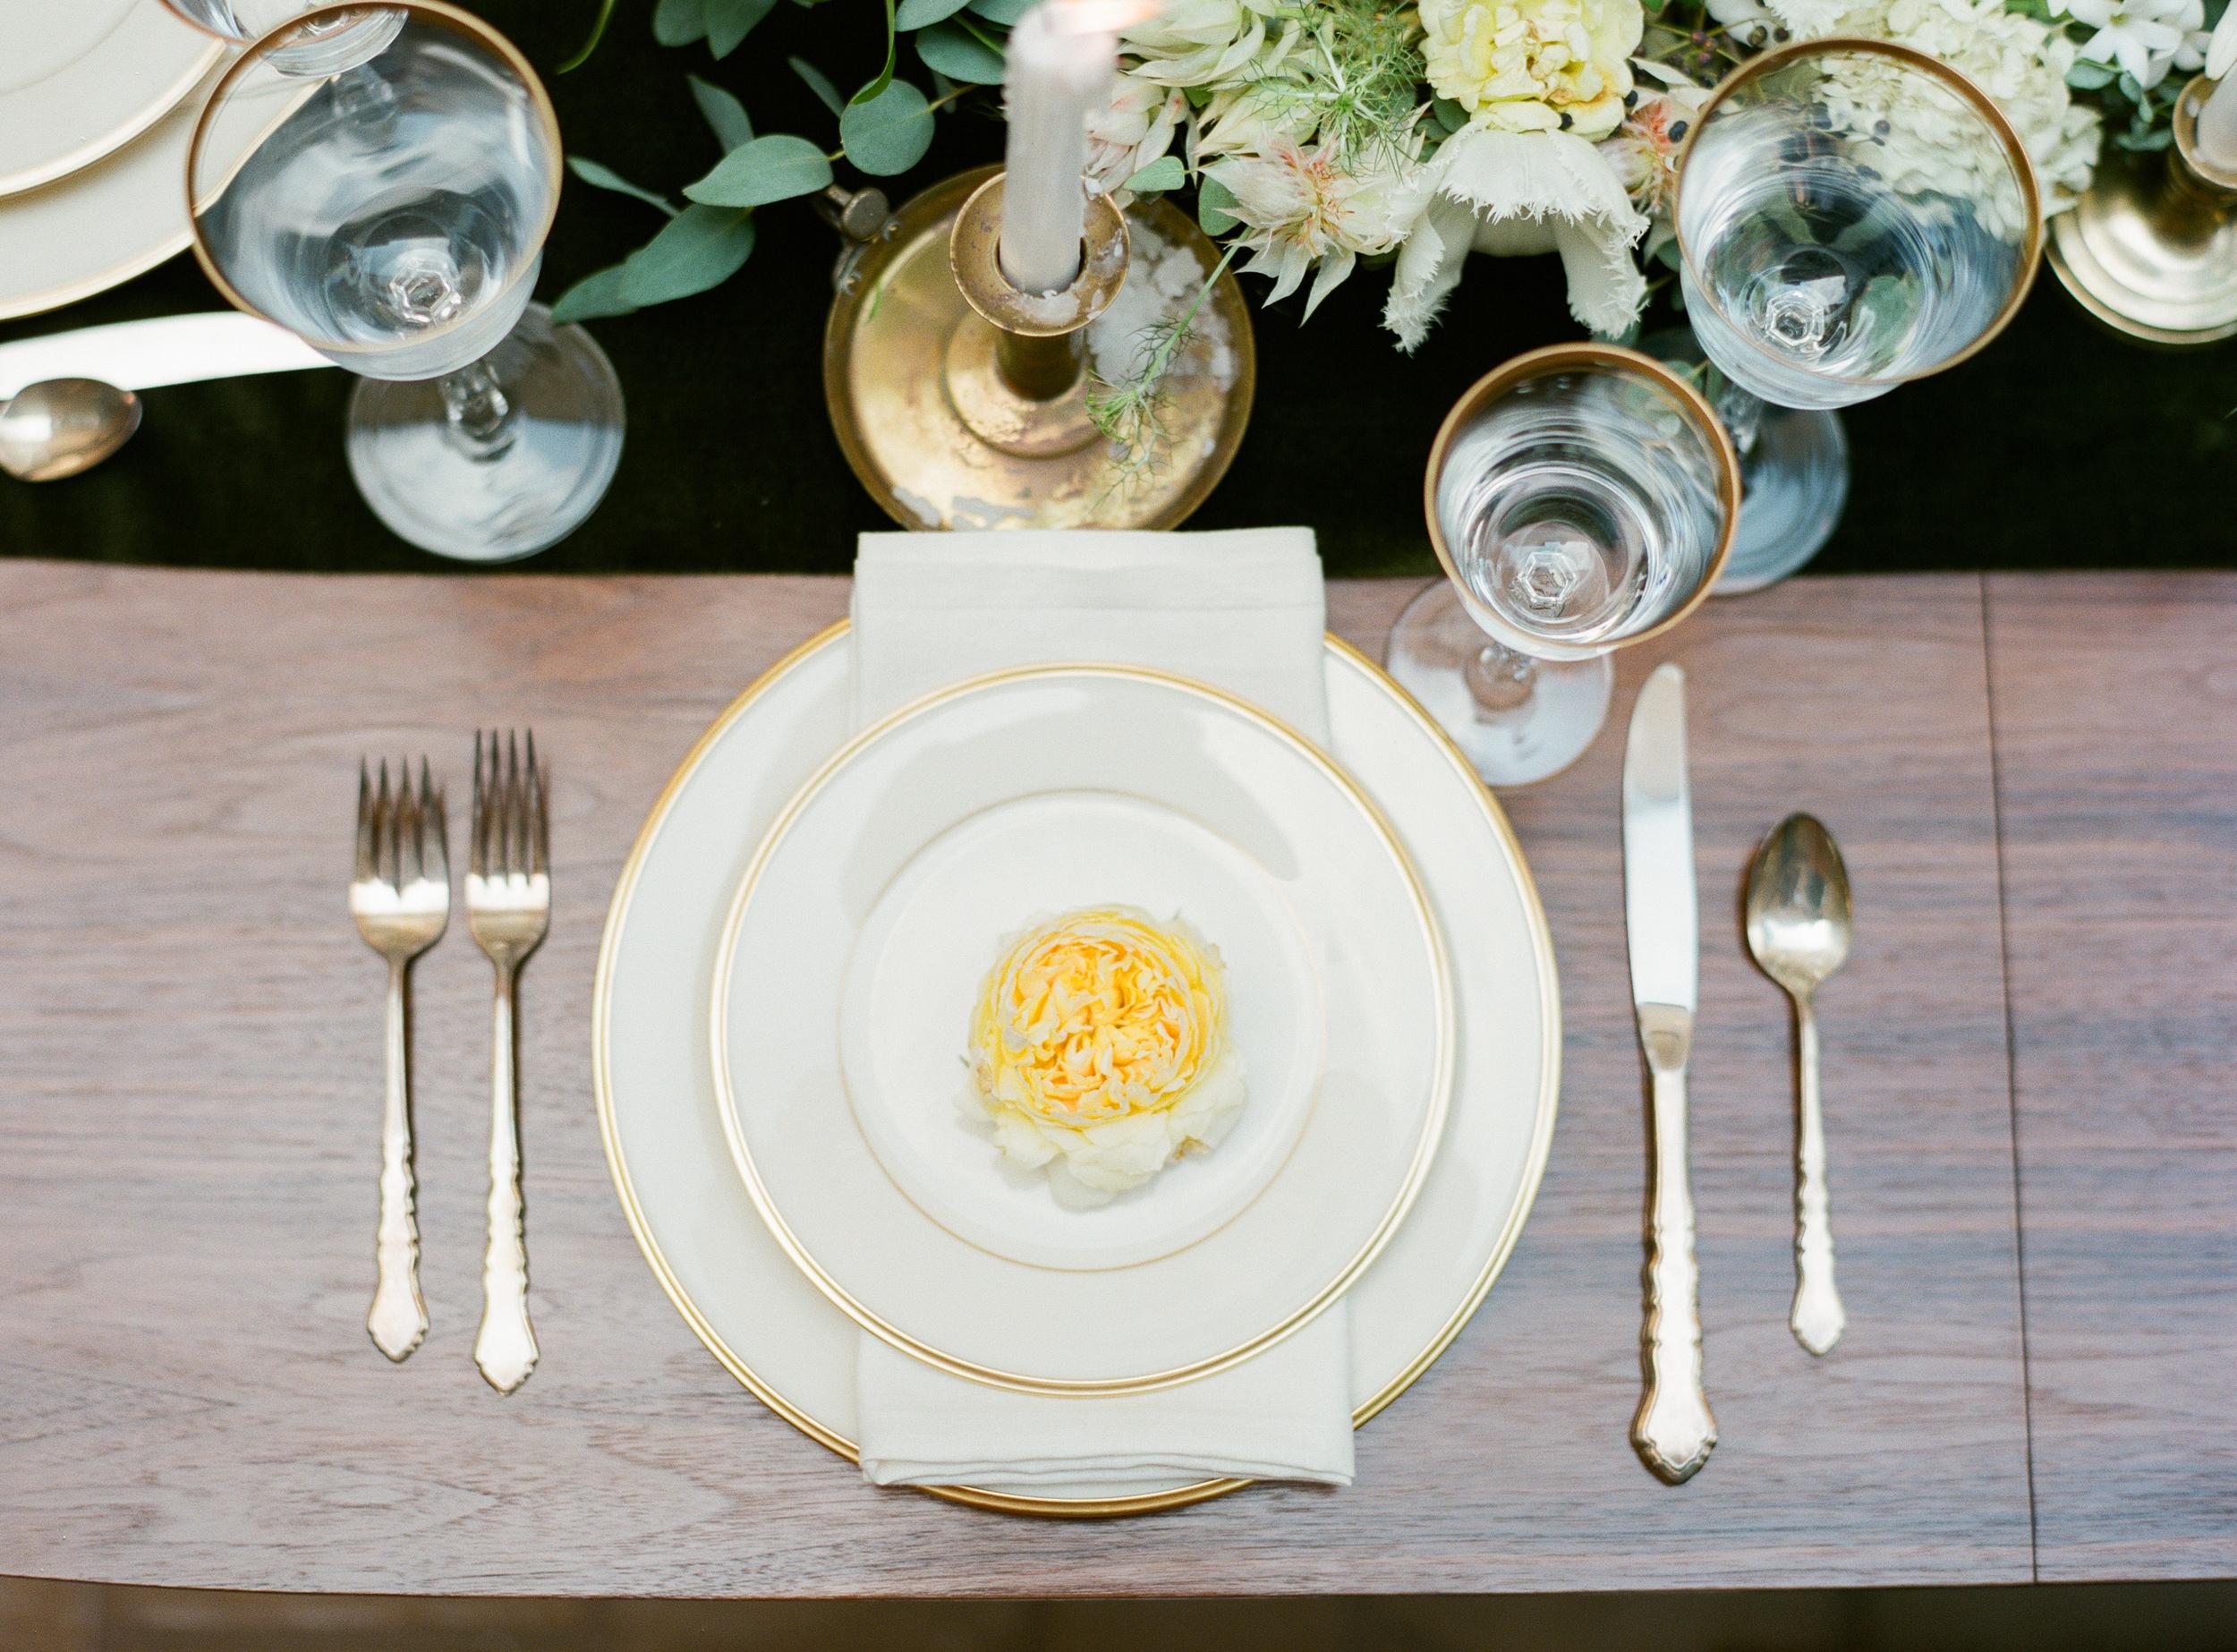 Olivia-Griffin-trendy-bride-magazine-willow-florals-sarah-seven-gwen-ivory-and-beau-bridal-boutique-savannah-wedding-dresses-savannah-bridal-boutique-savannah-wedding-savannah-bridal-gowns-savannah-wedding-planner-georgia-bridal-boutique-17.JPG